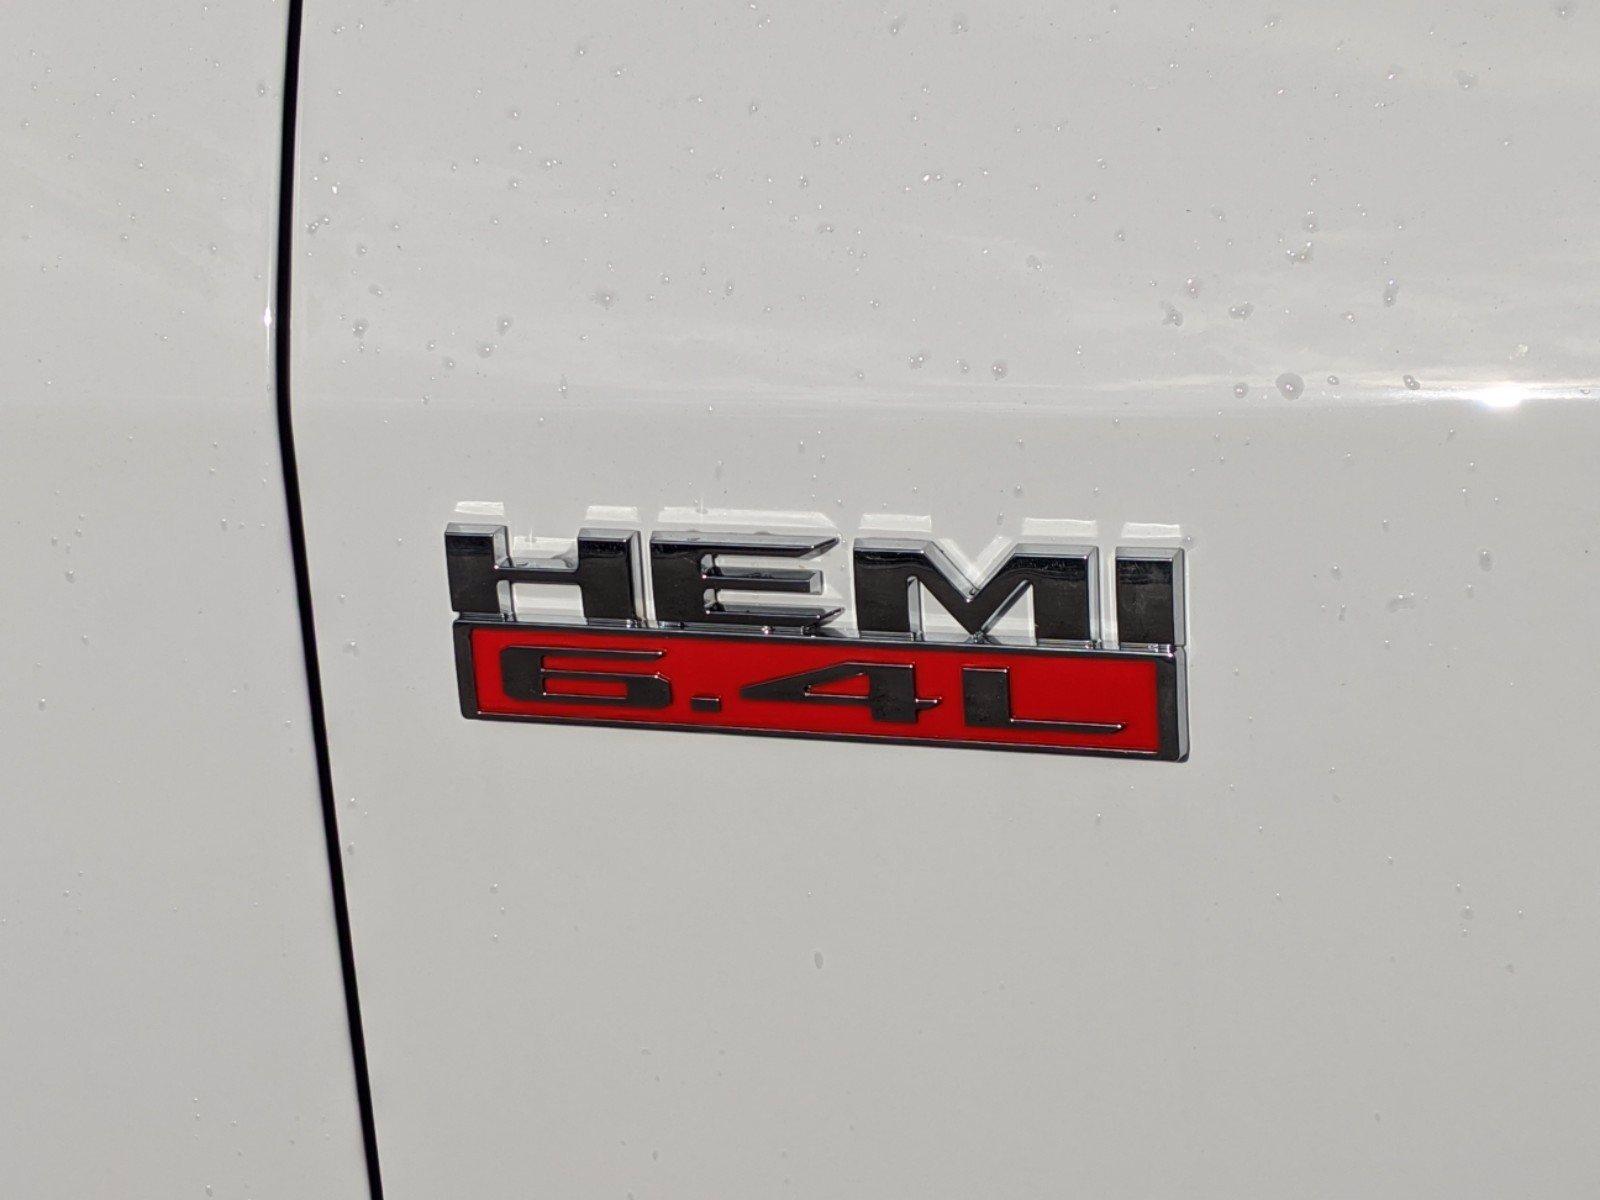 2020 Ram 3500 Crew Cab DRW 4x4, Cab Chassis #R20462 - photo 1